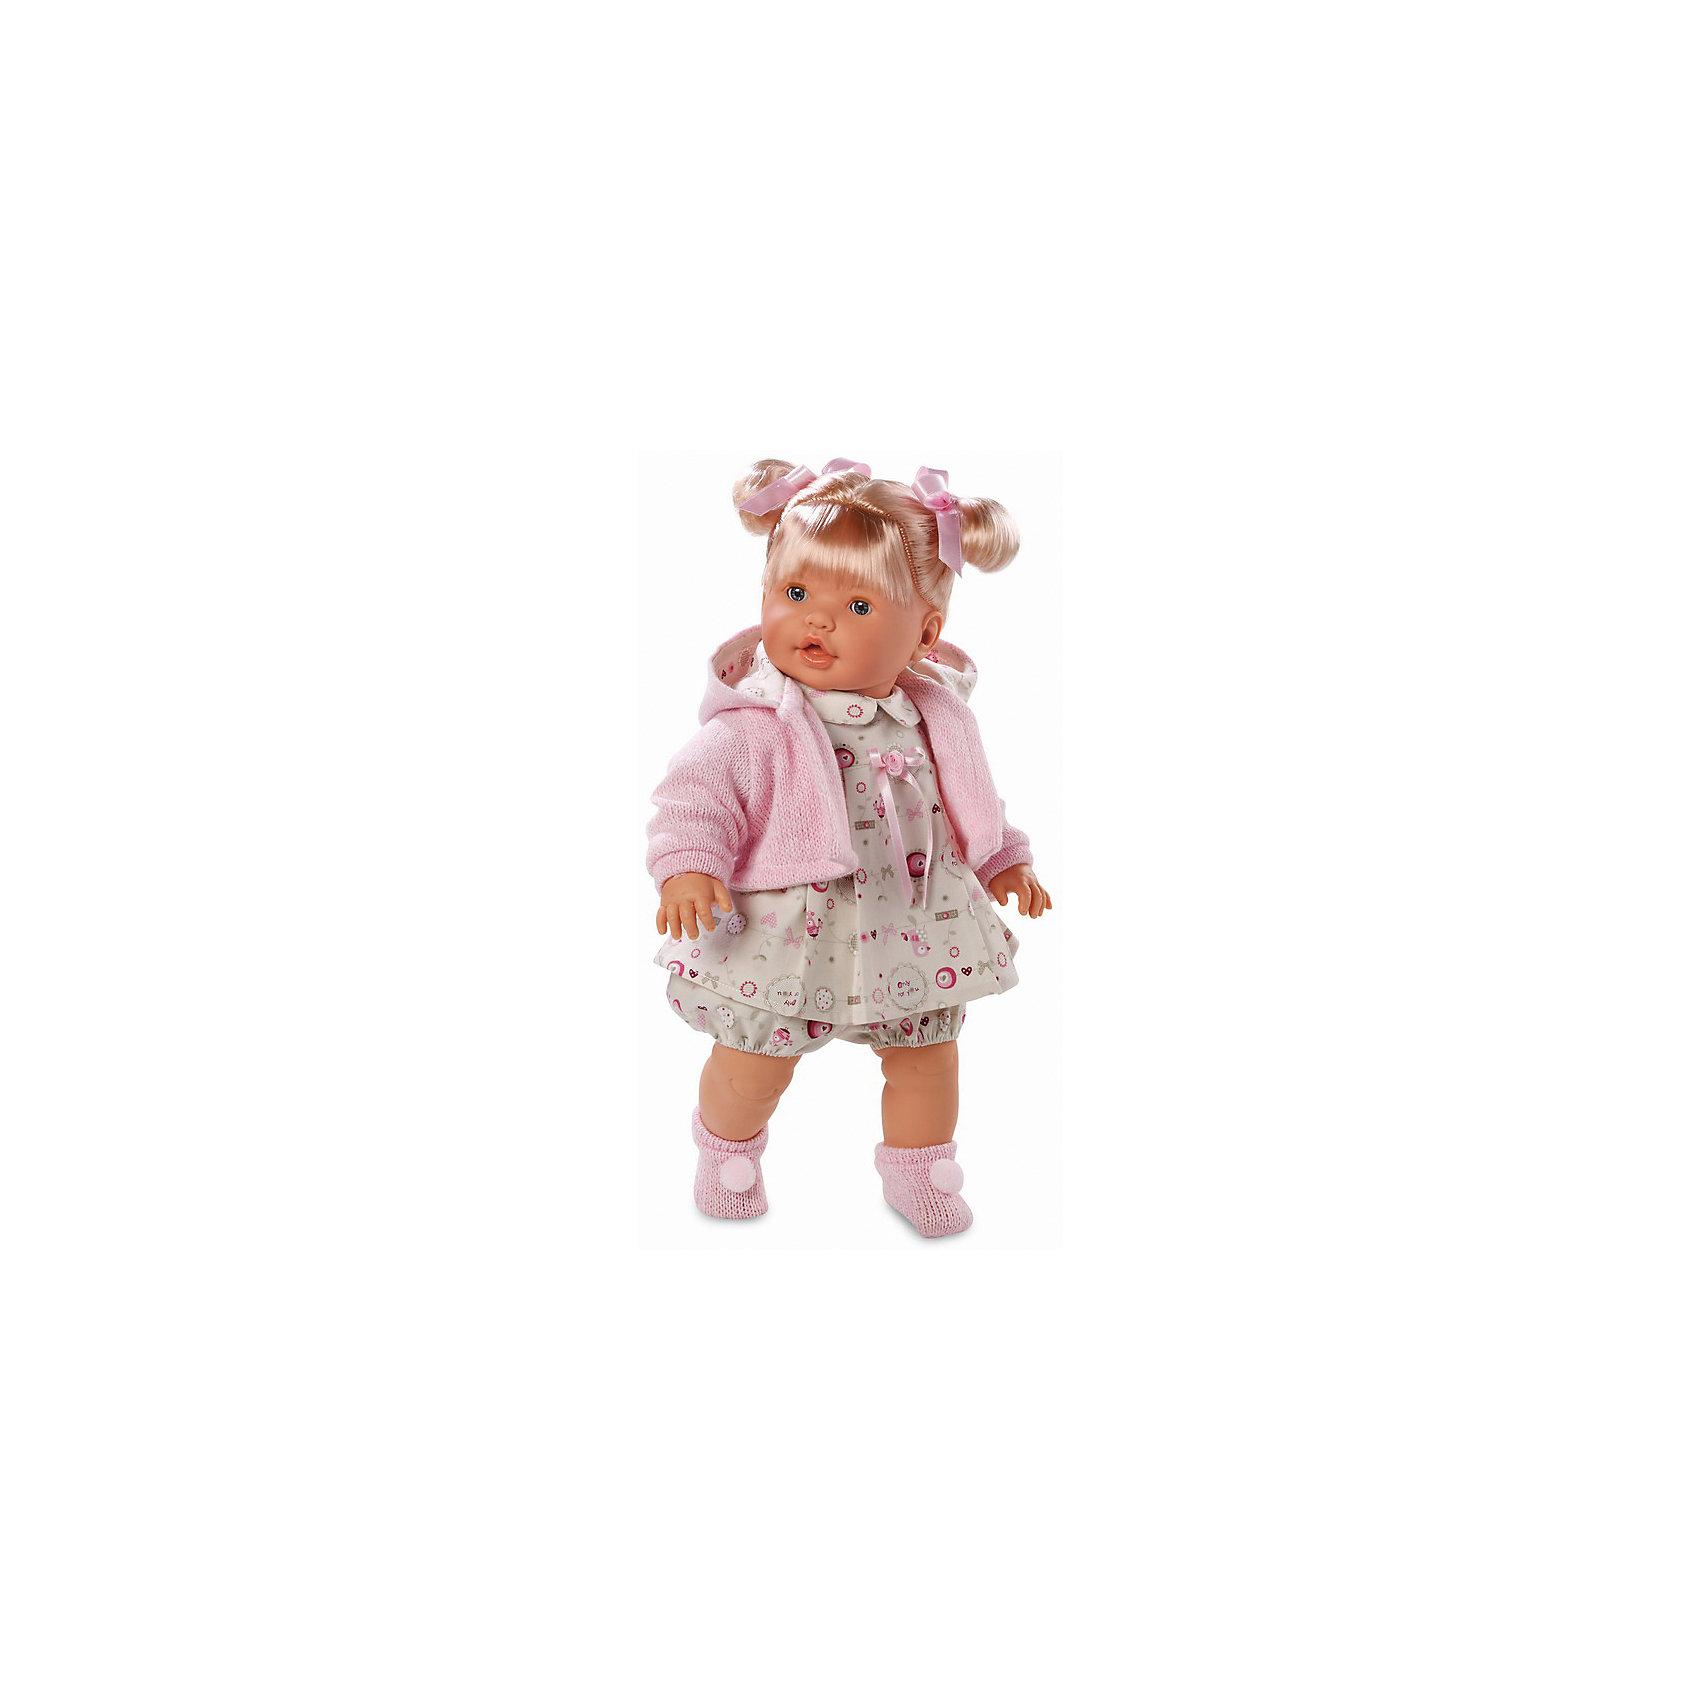 Llorens Кукла, 48 см, Llorens куклы и одежда для кукол llorens кукла изабела 33 см со звуком